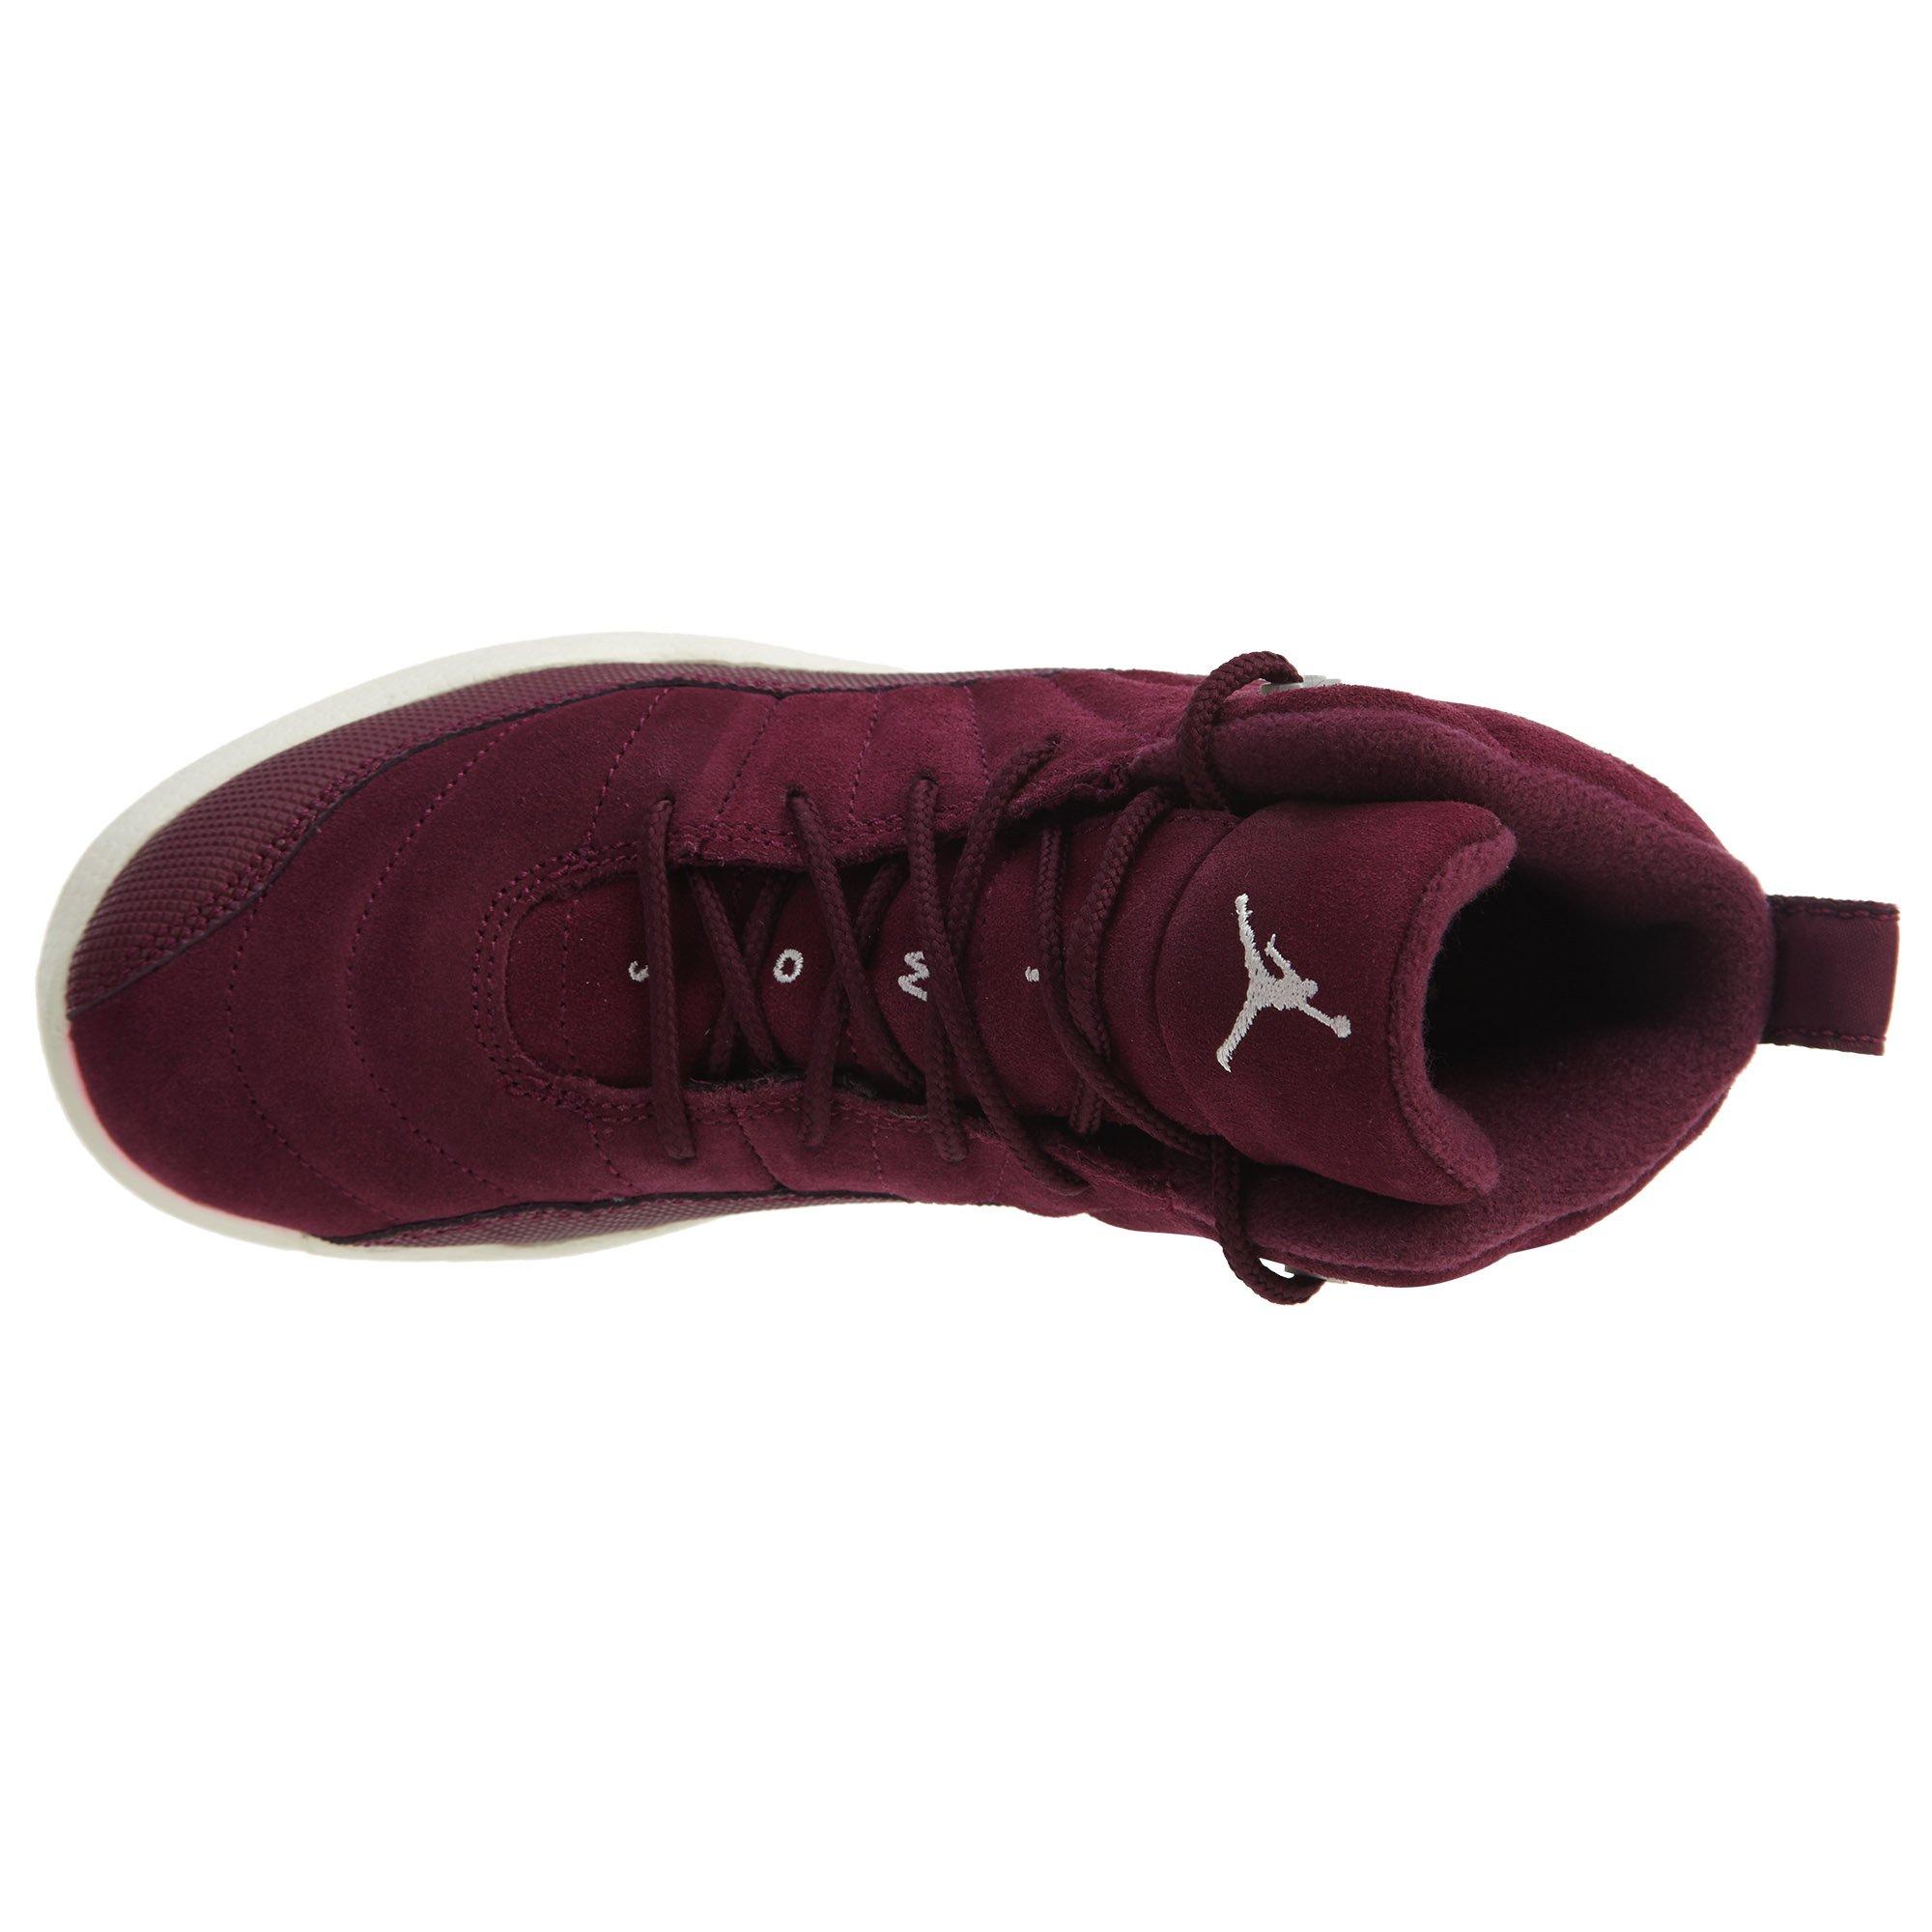 cfded4d6485 Jordan 12 Retro Little Kids Style: 151186-617 Size: 11 | Amazon